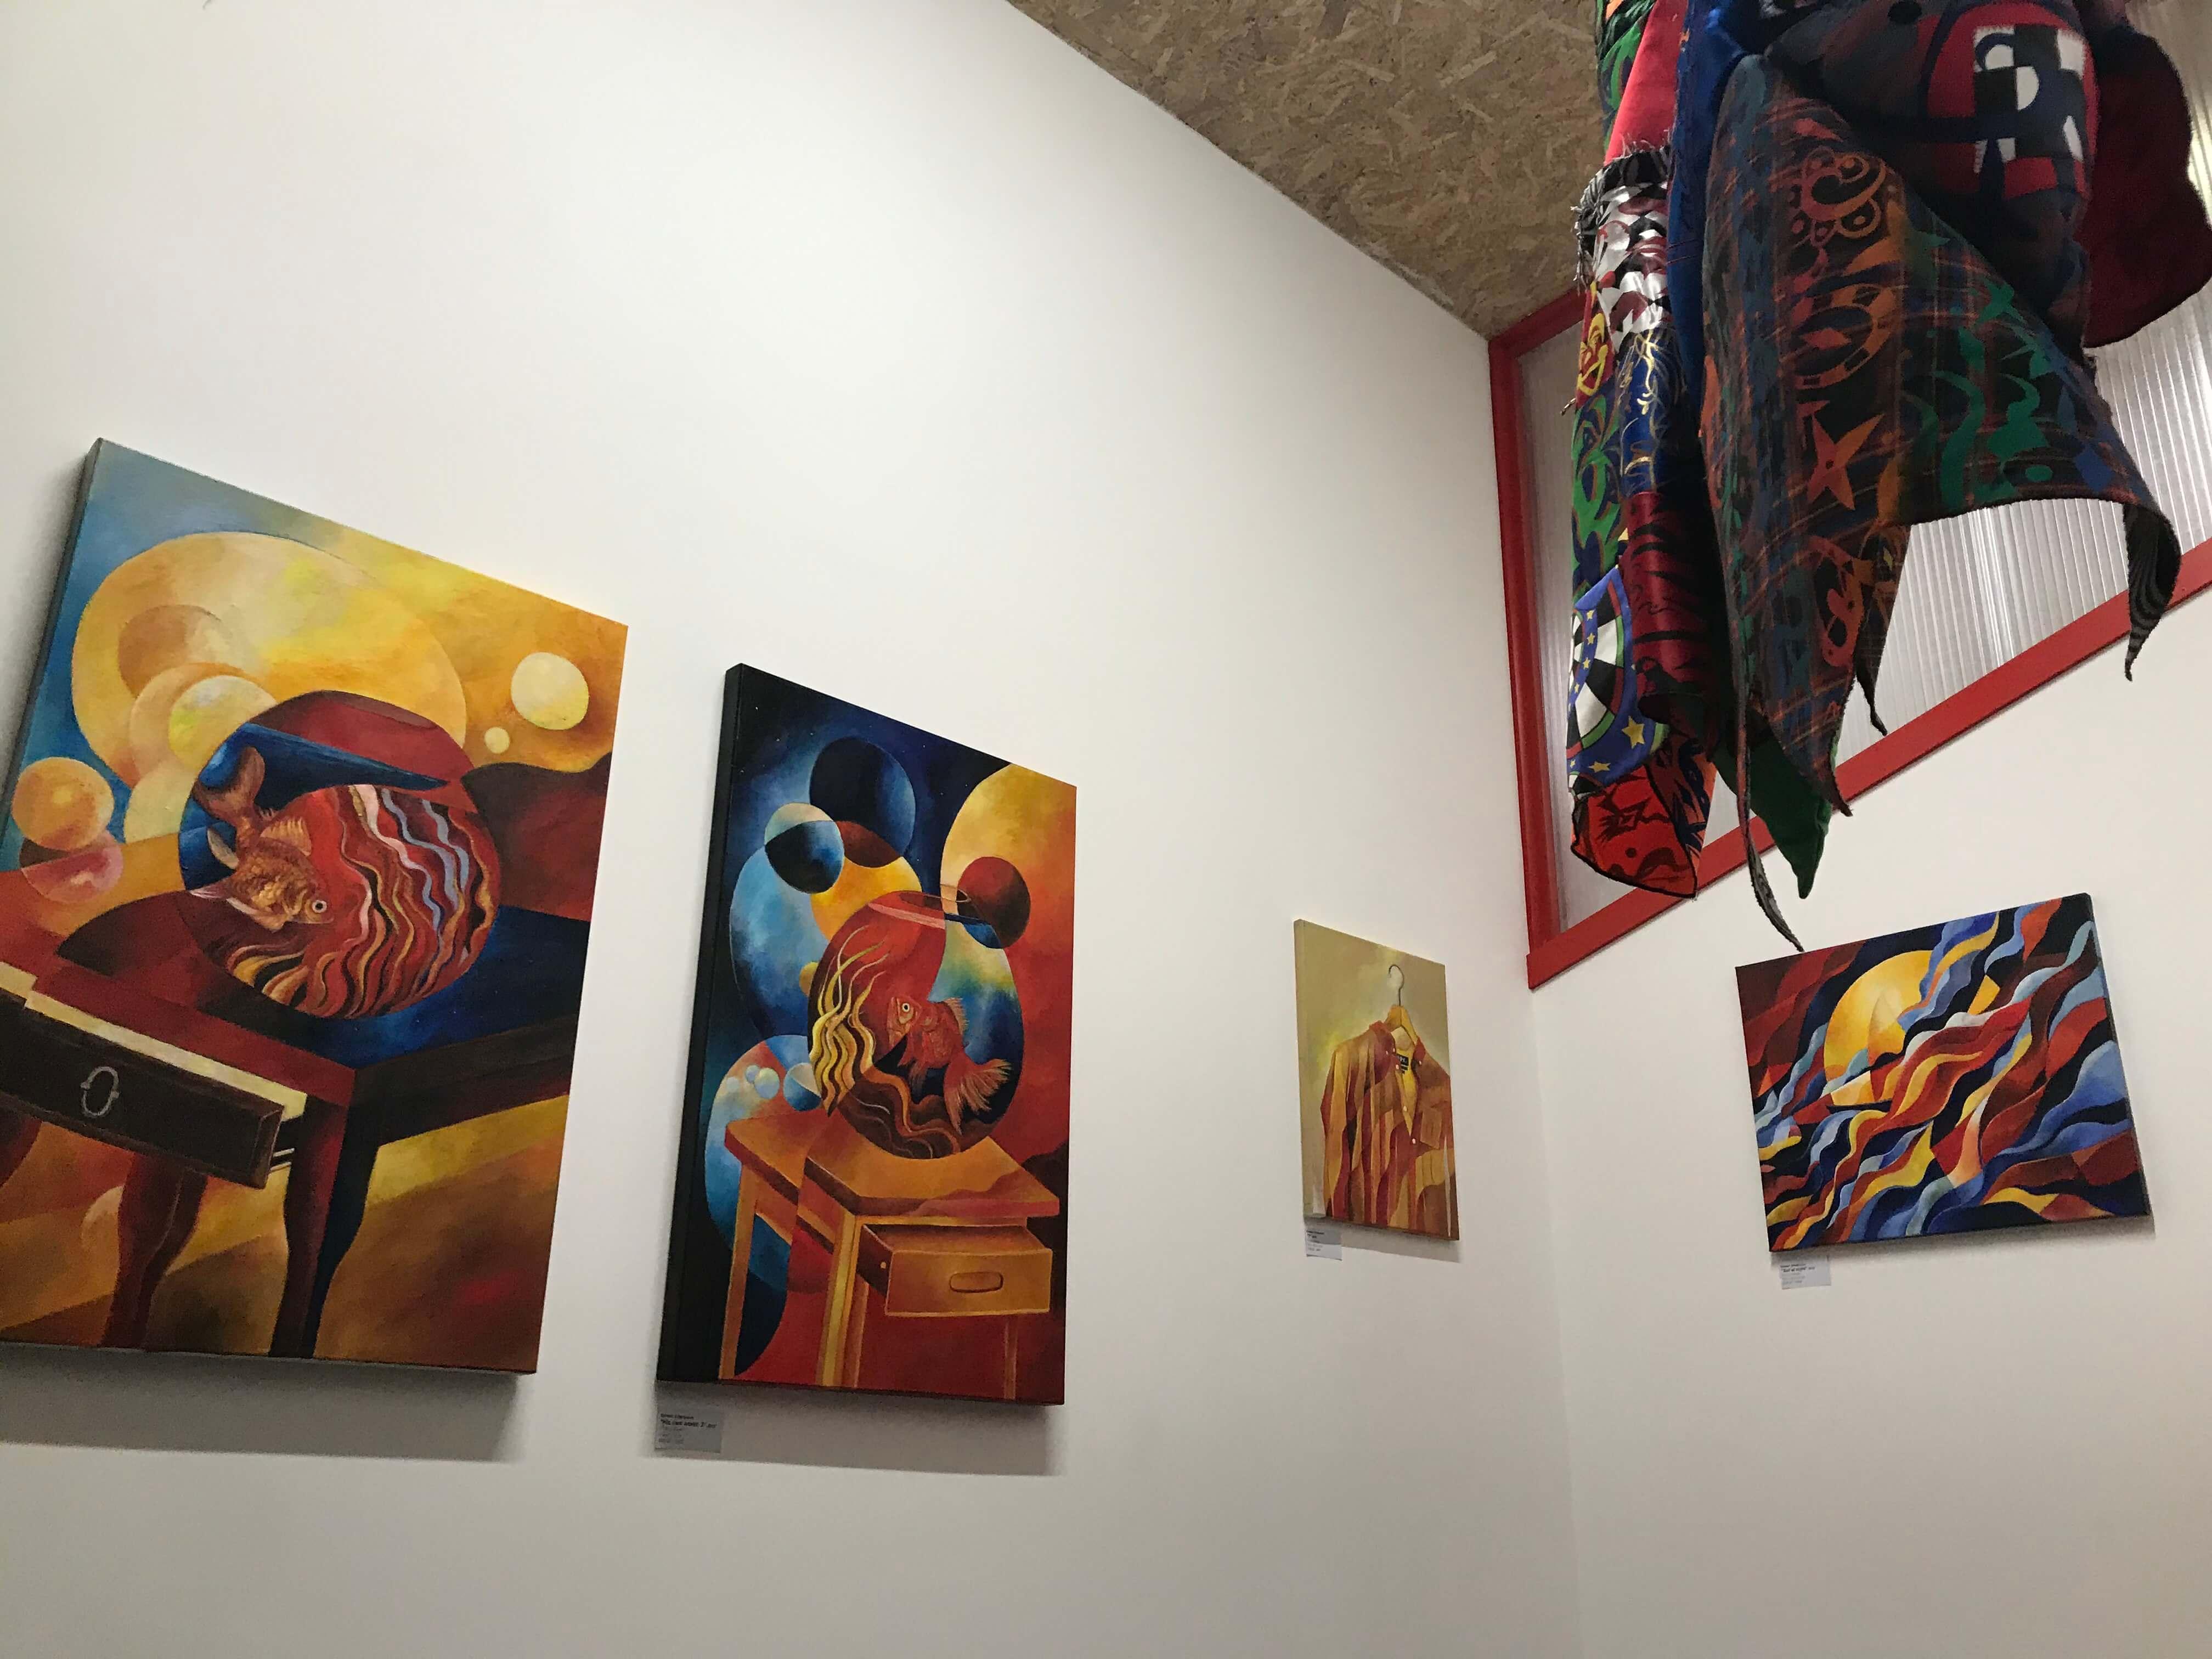 Siméon Artamonov at North London Art -  at Harringay Warehouse District